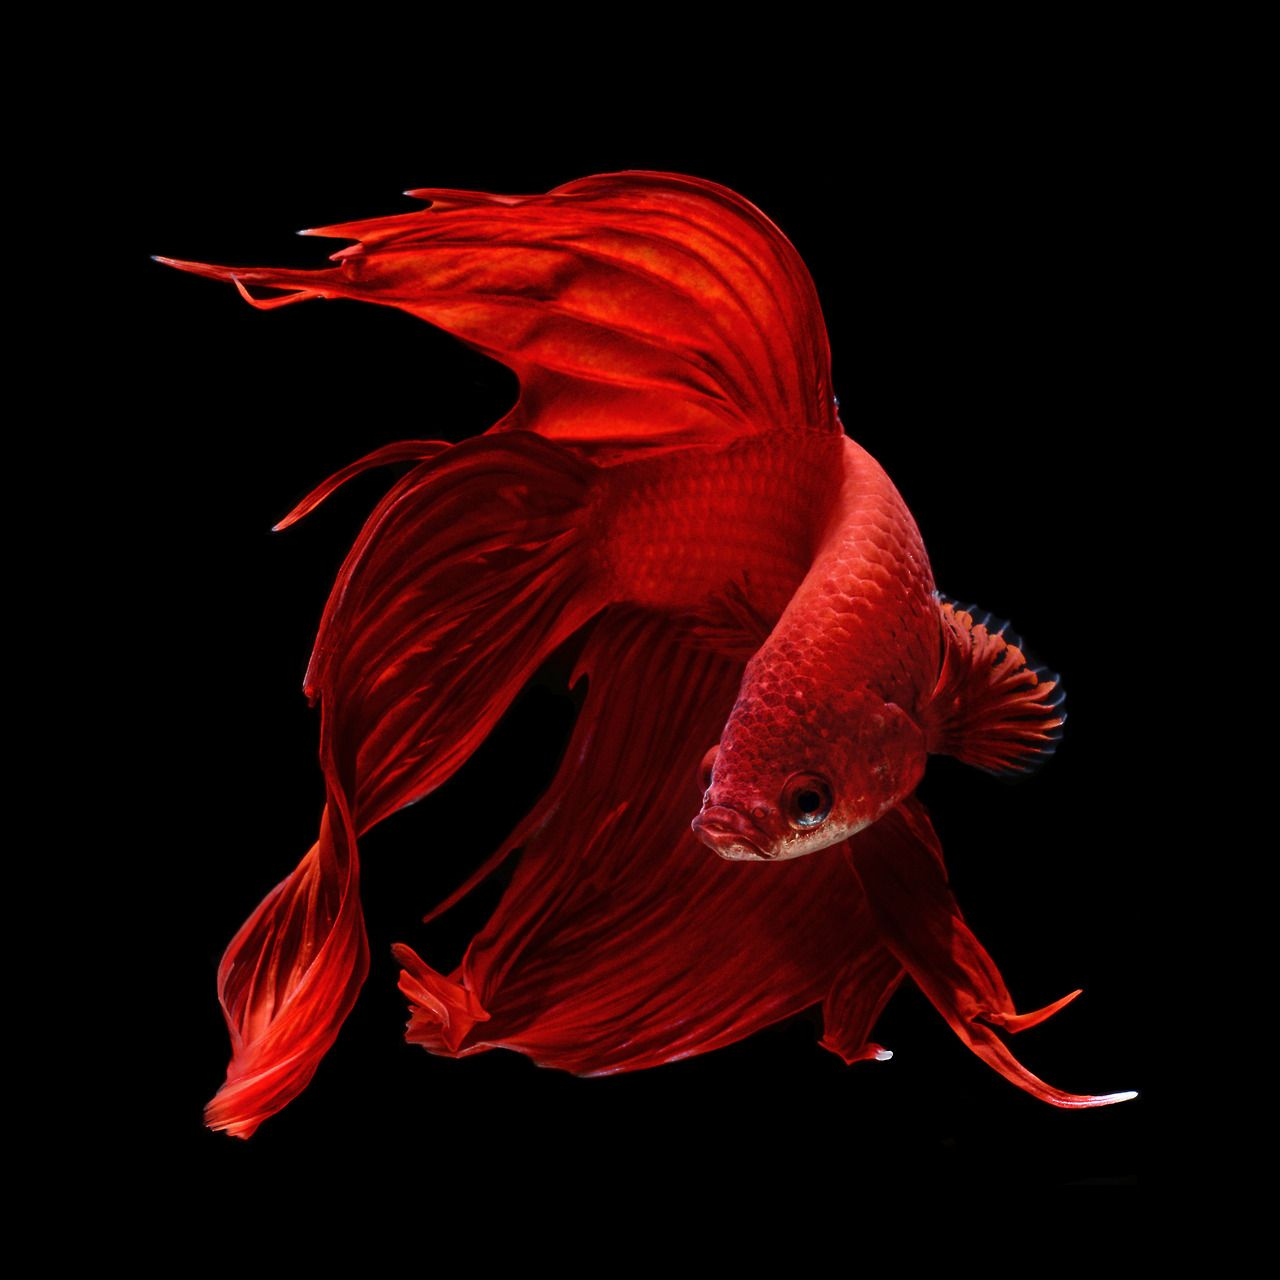 Red betta fish animalz pinterest for Red betta fish